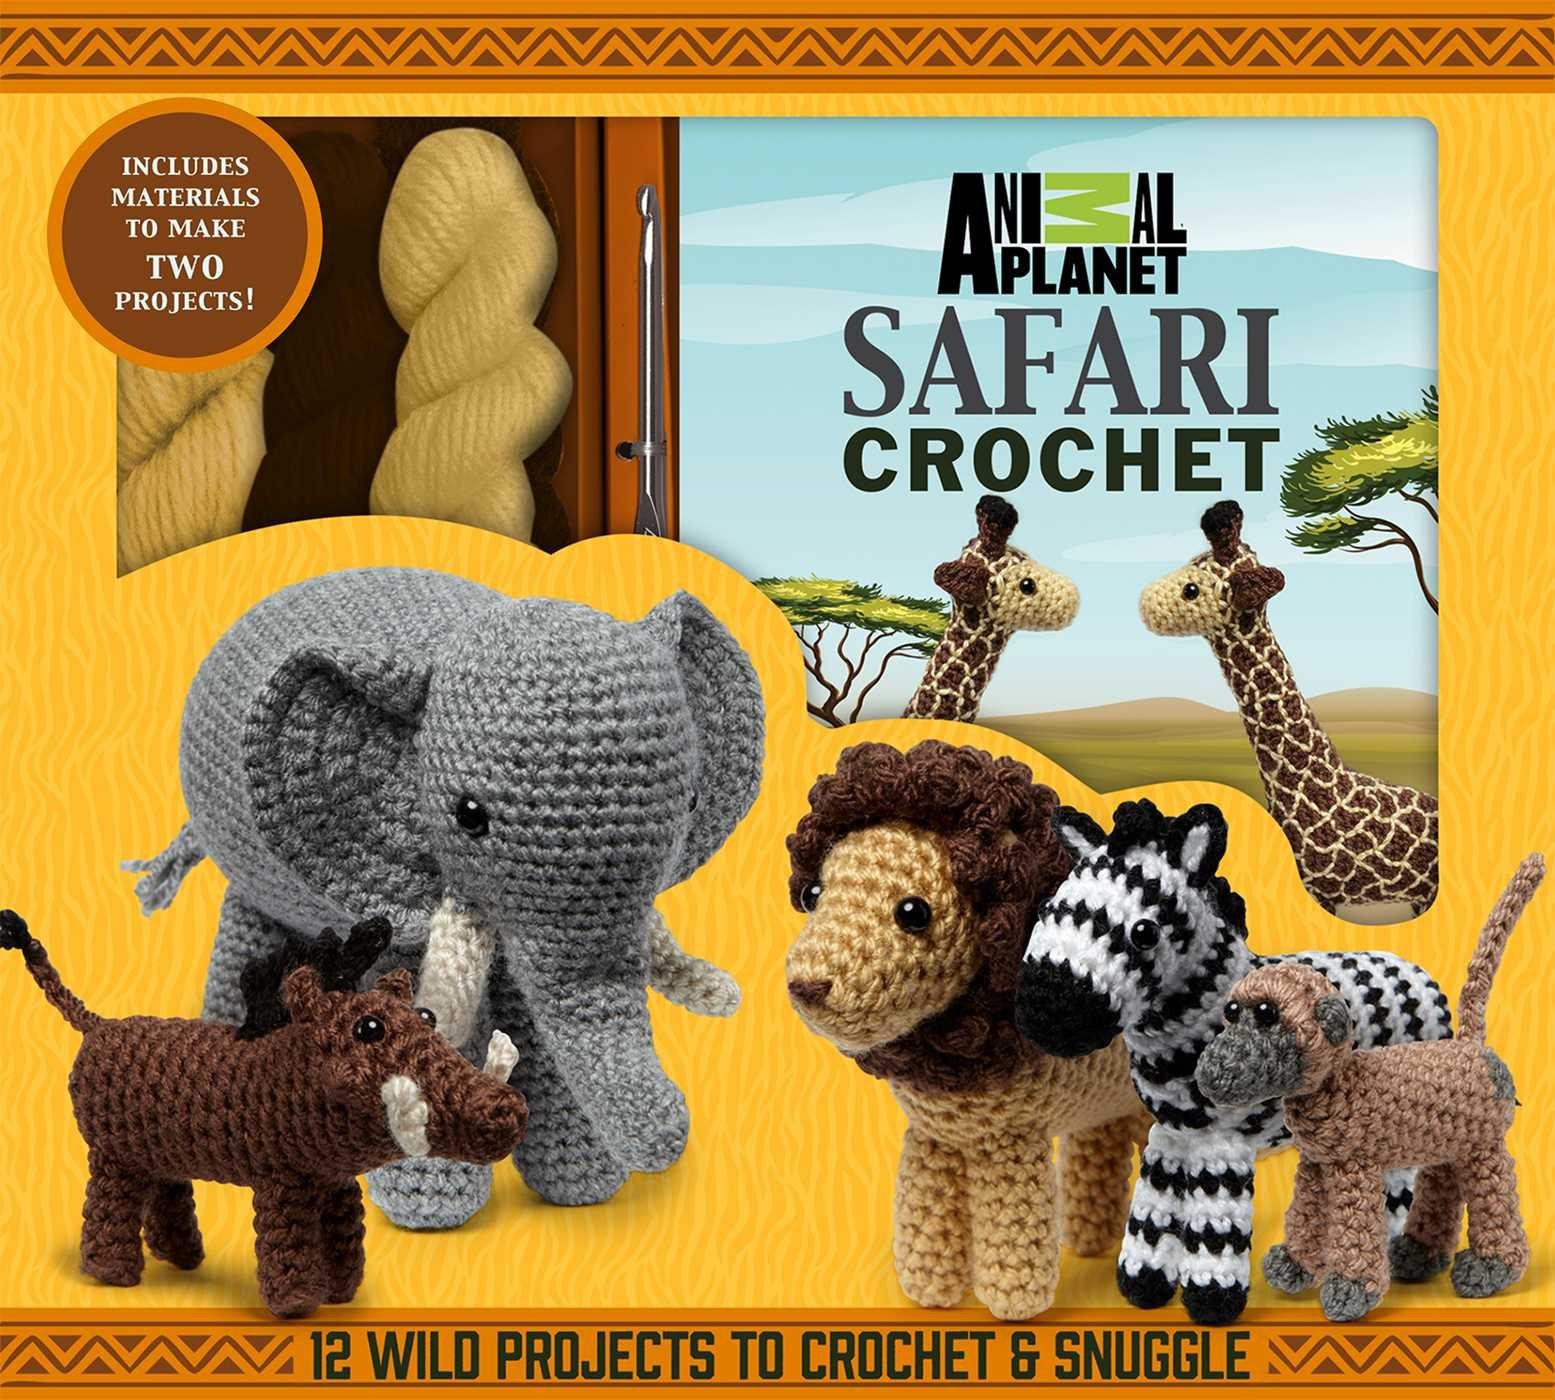 Animal Planet Safari Crochet Galusz product image